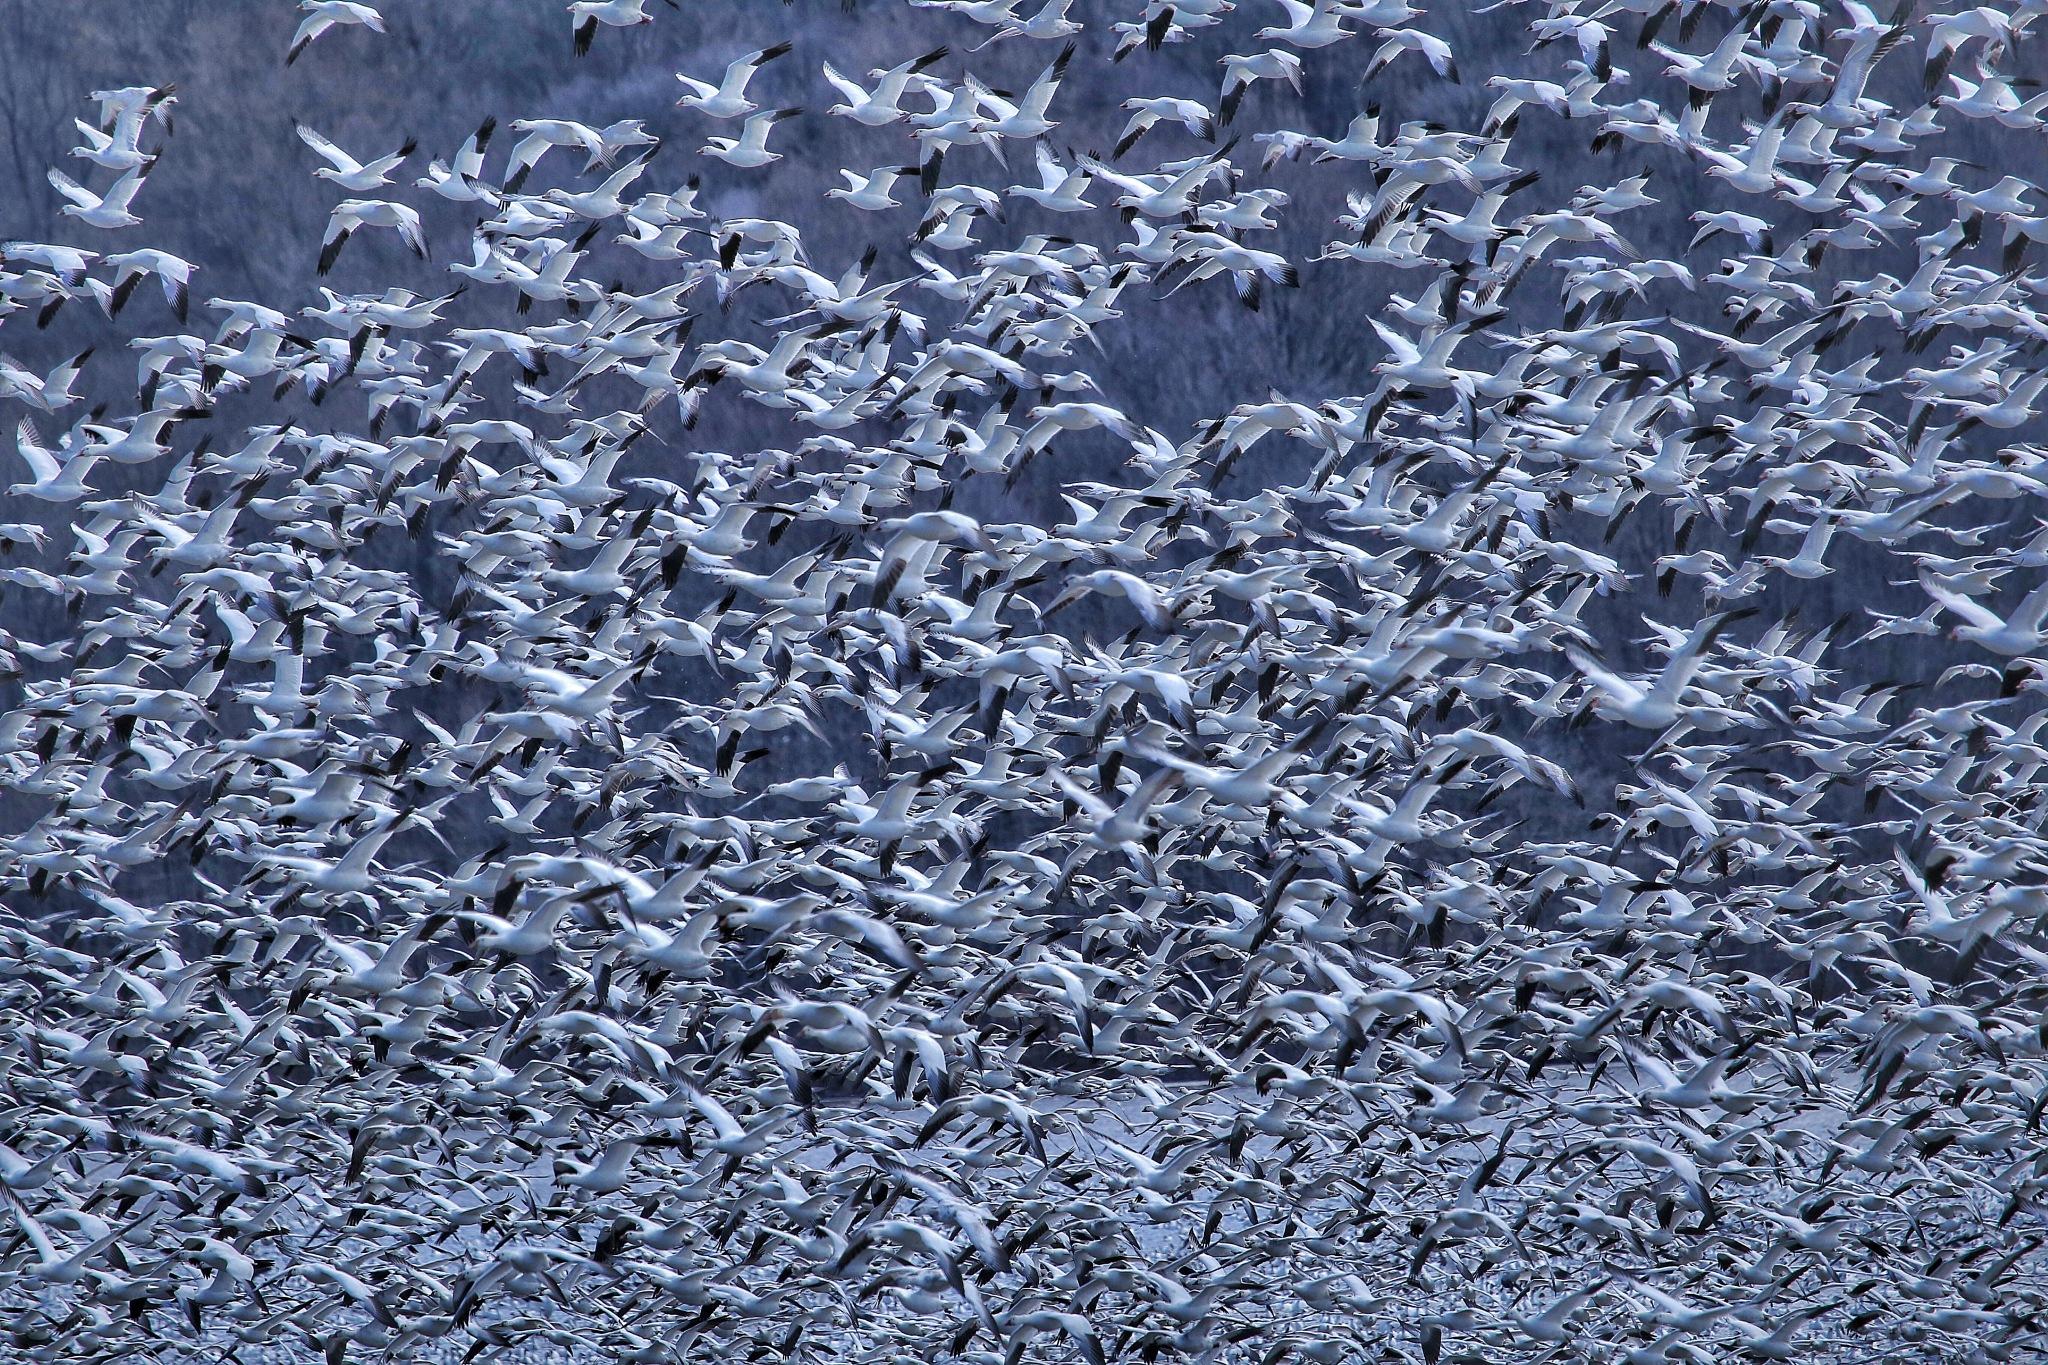 Just a Few Snow Geese by PamelaZ